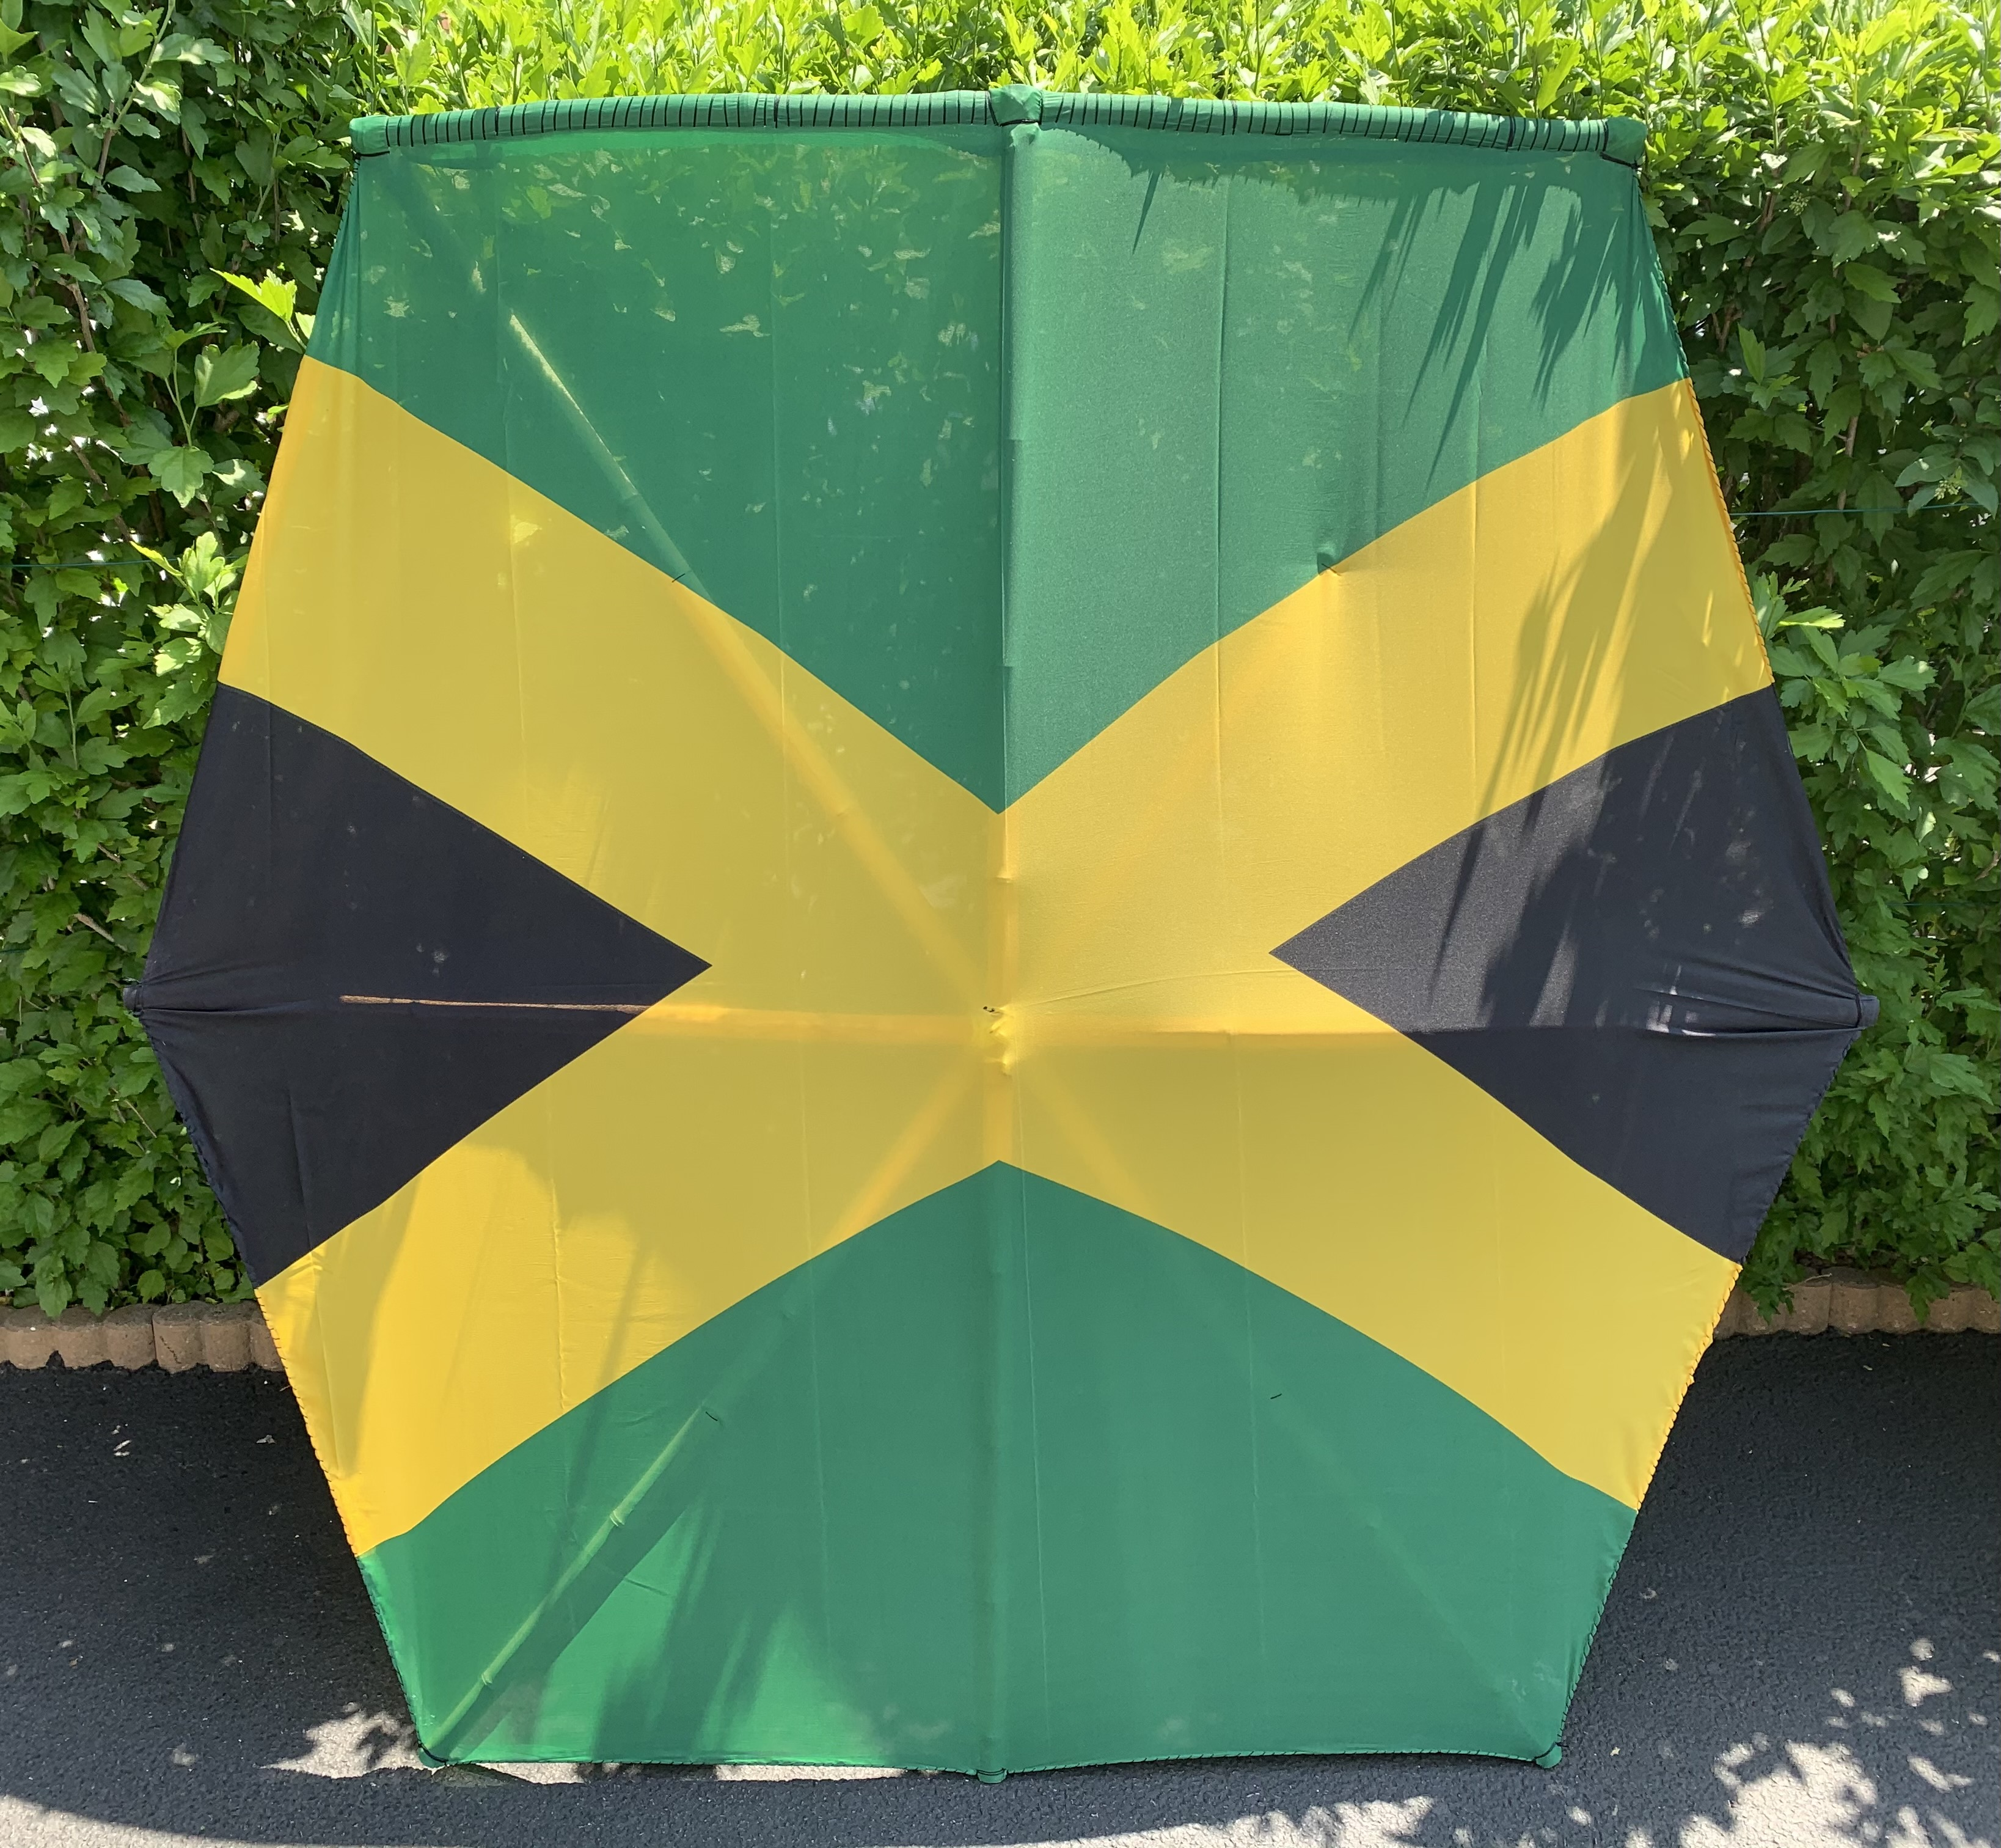 5 feet jamaican flag kite